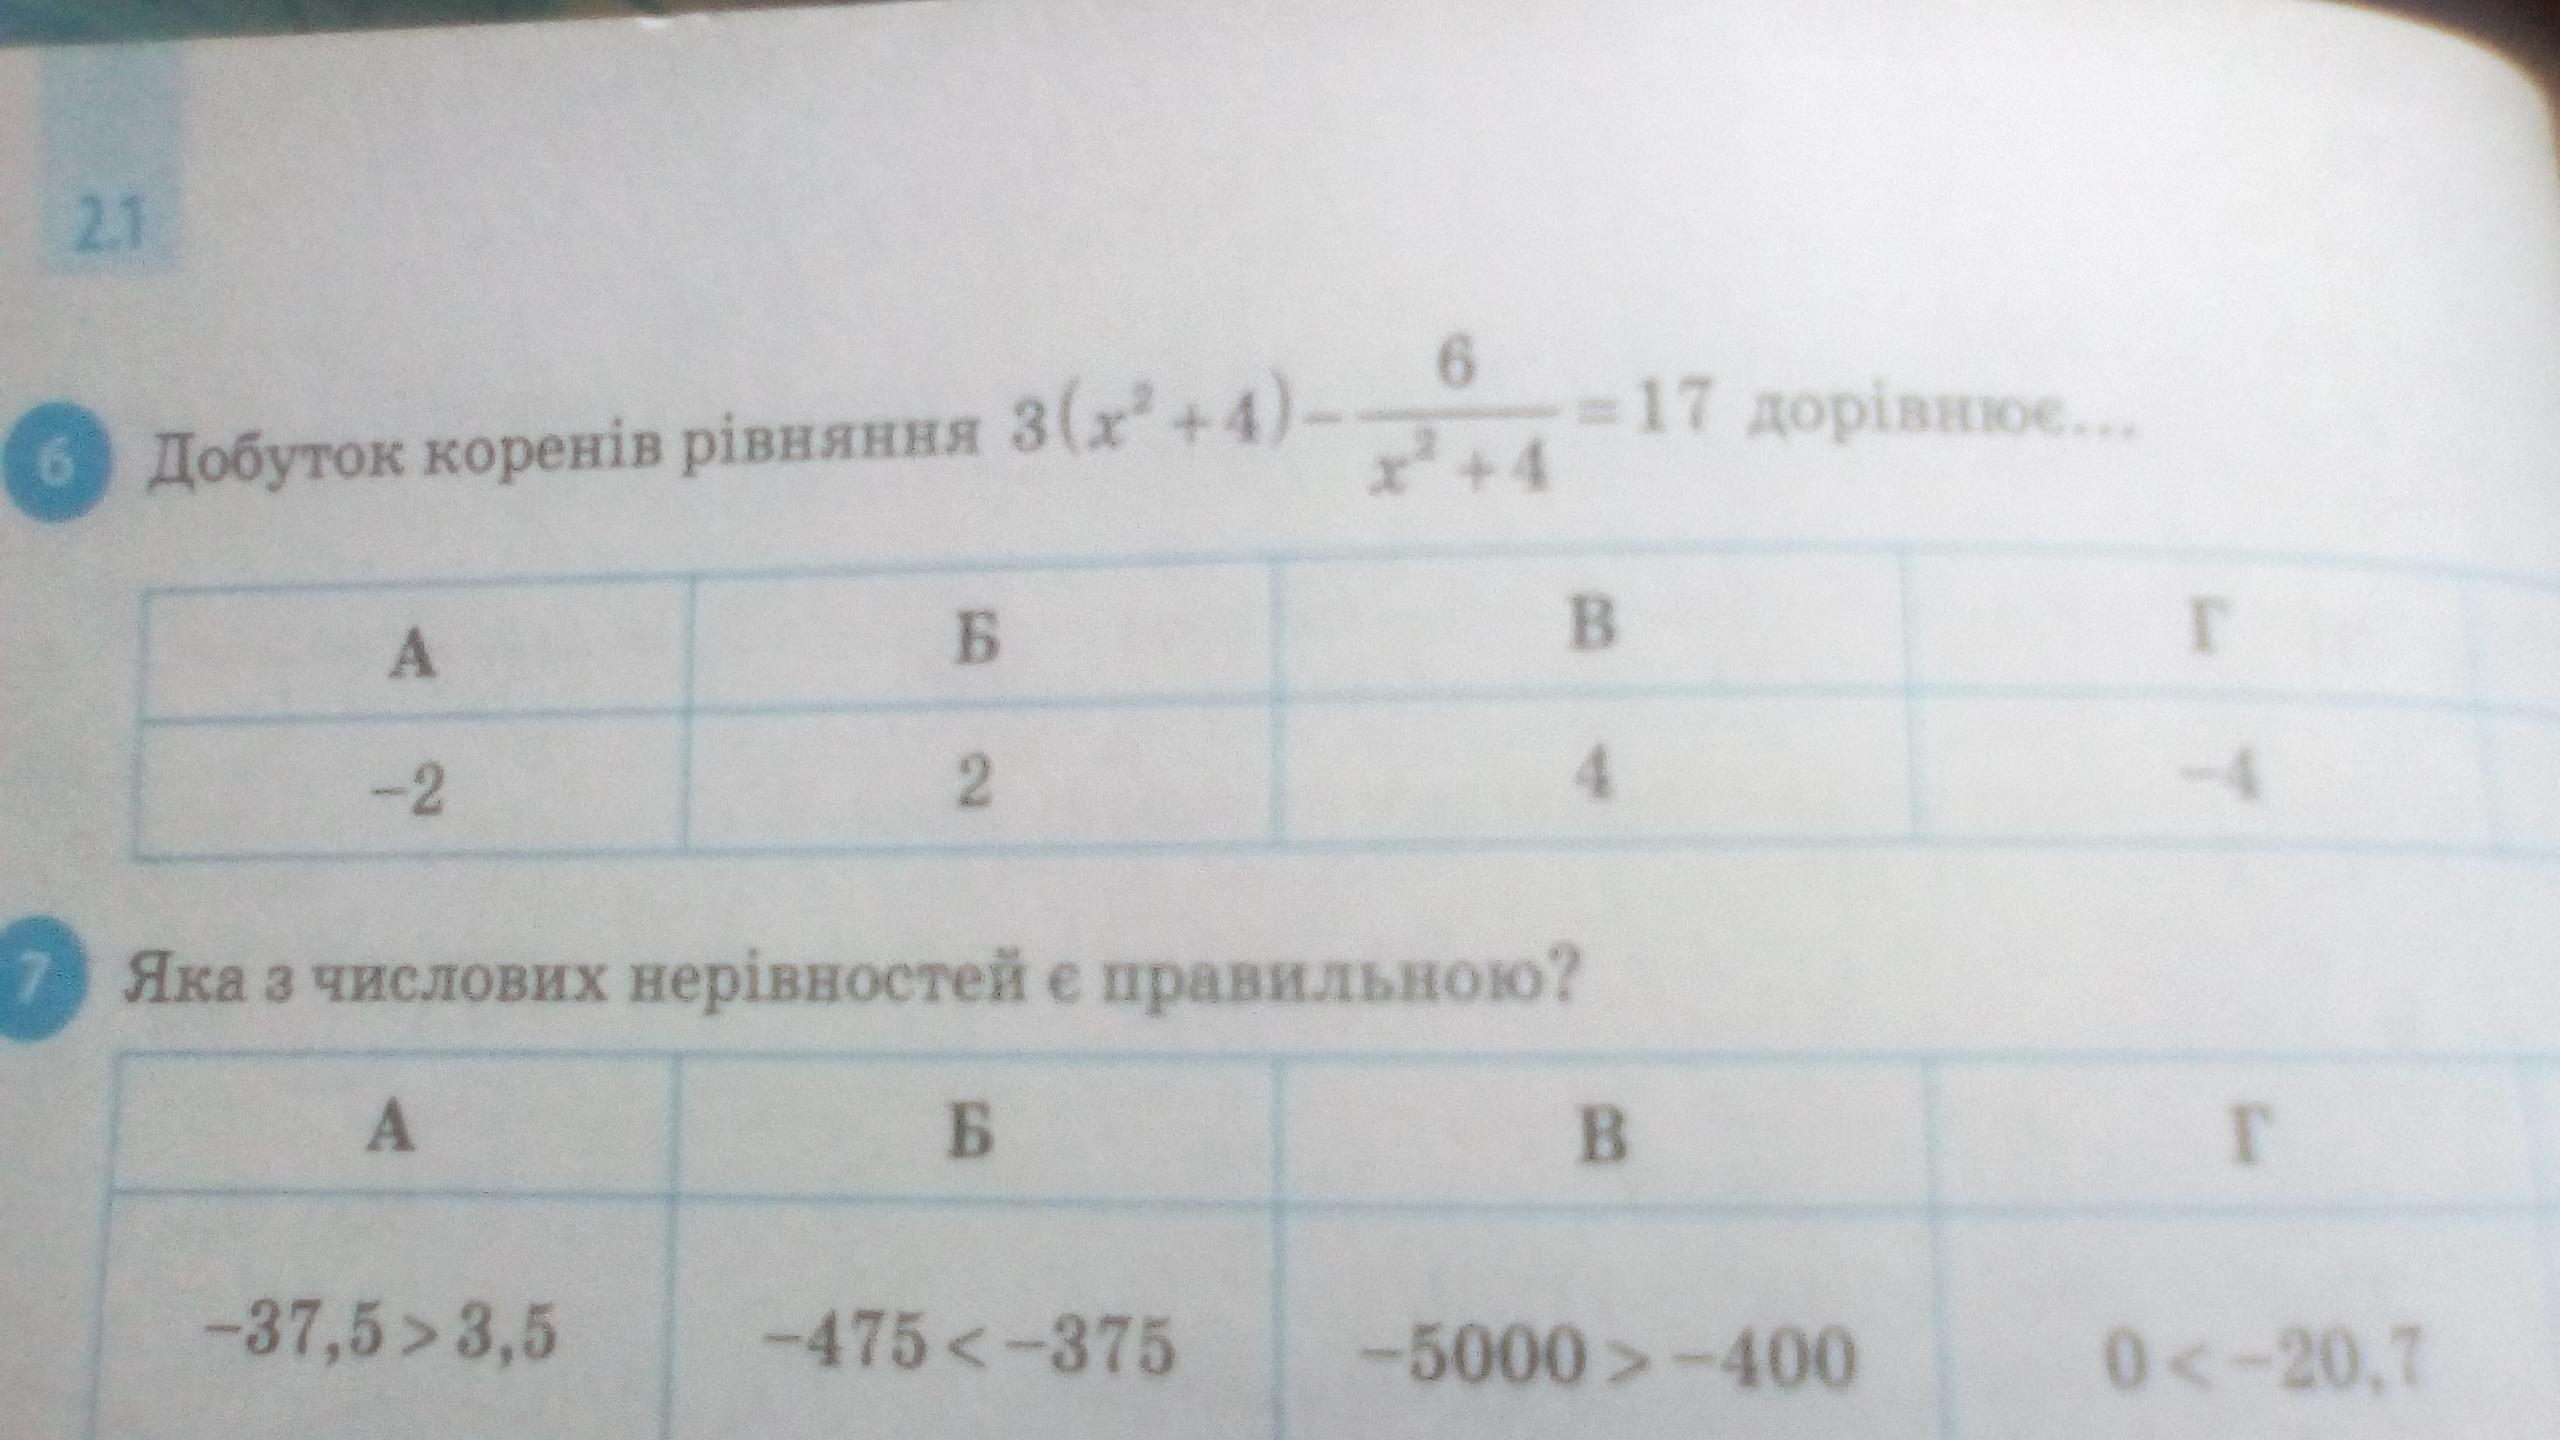 Помогите ето решить вопрос на фото 6 задание